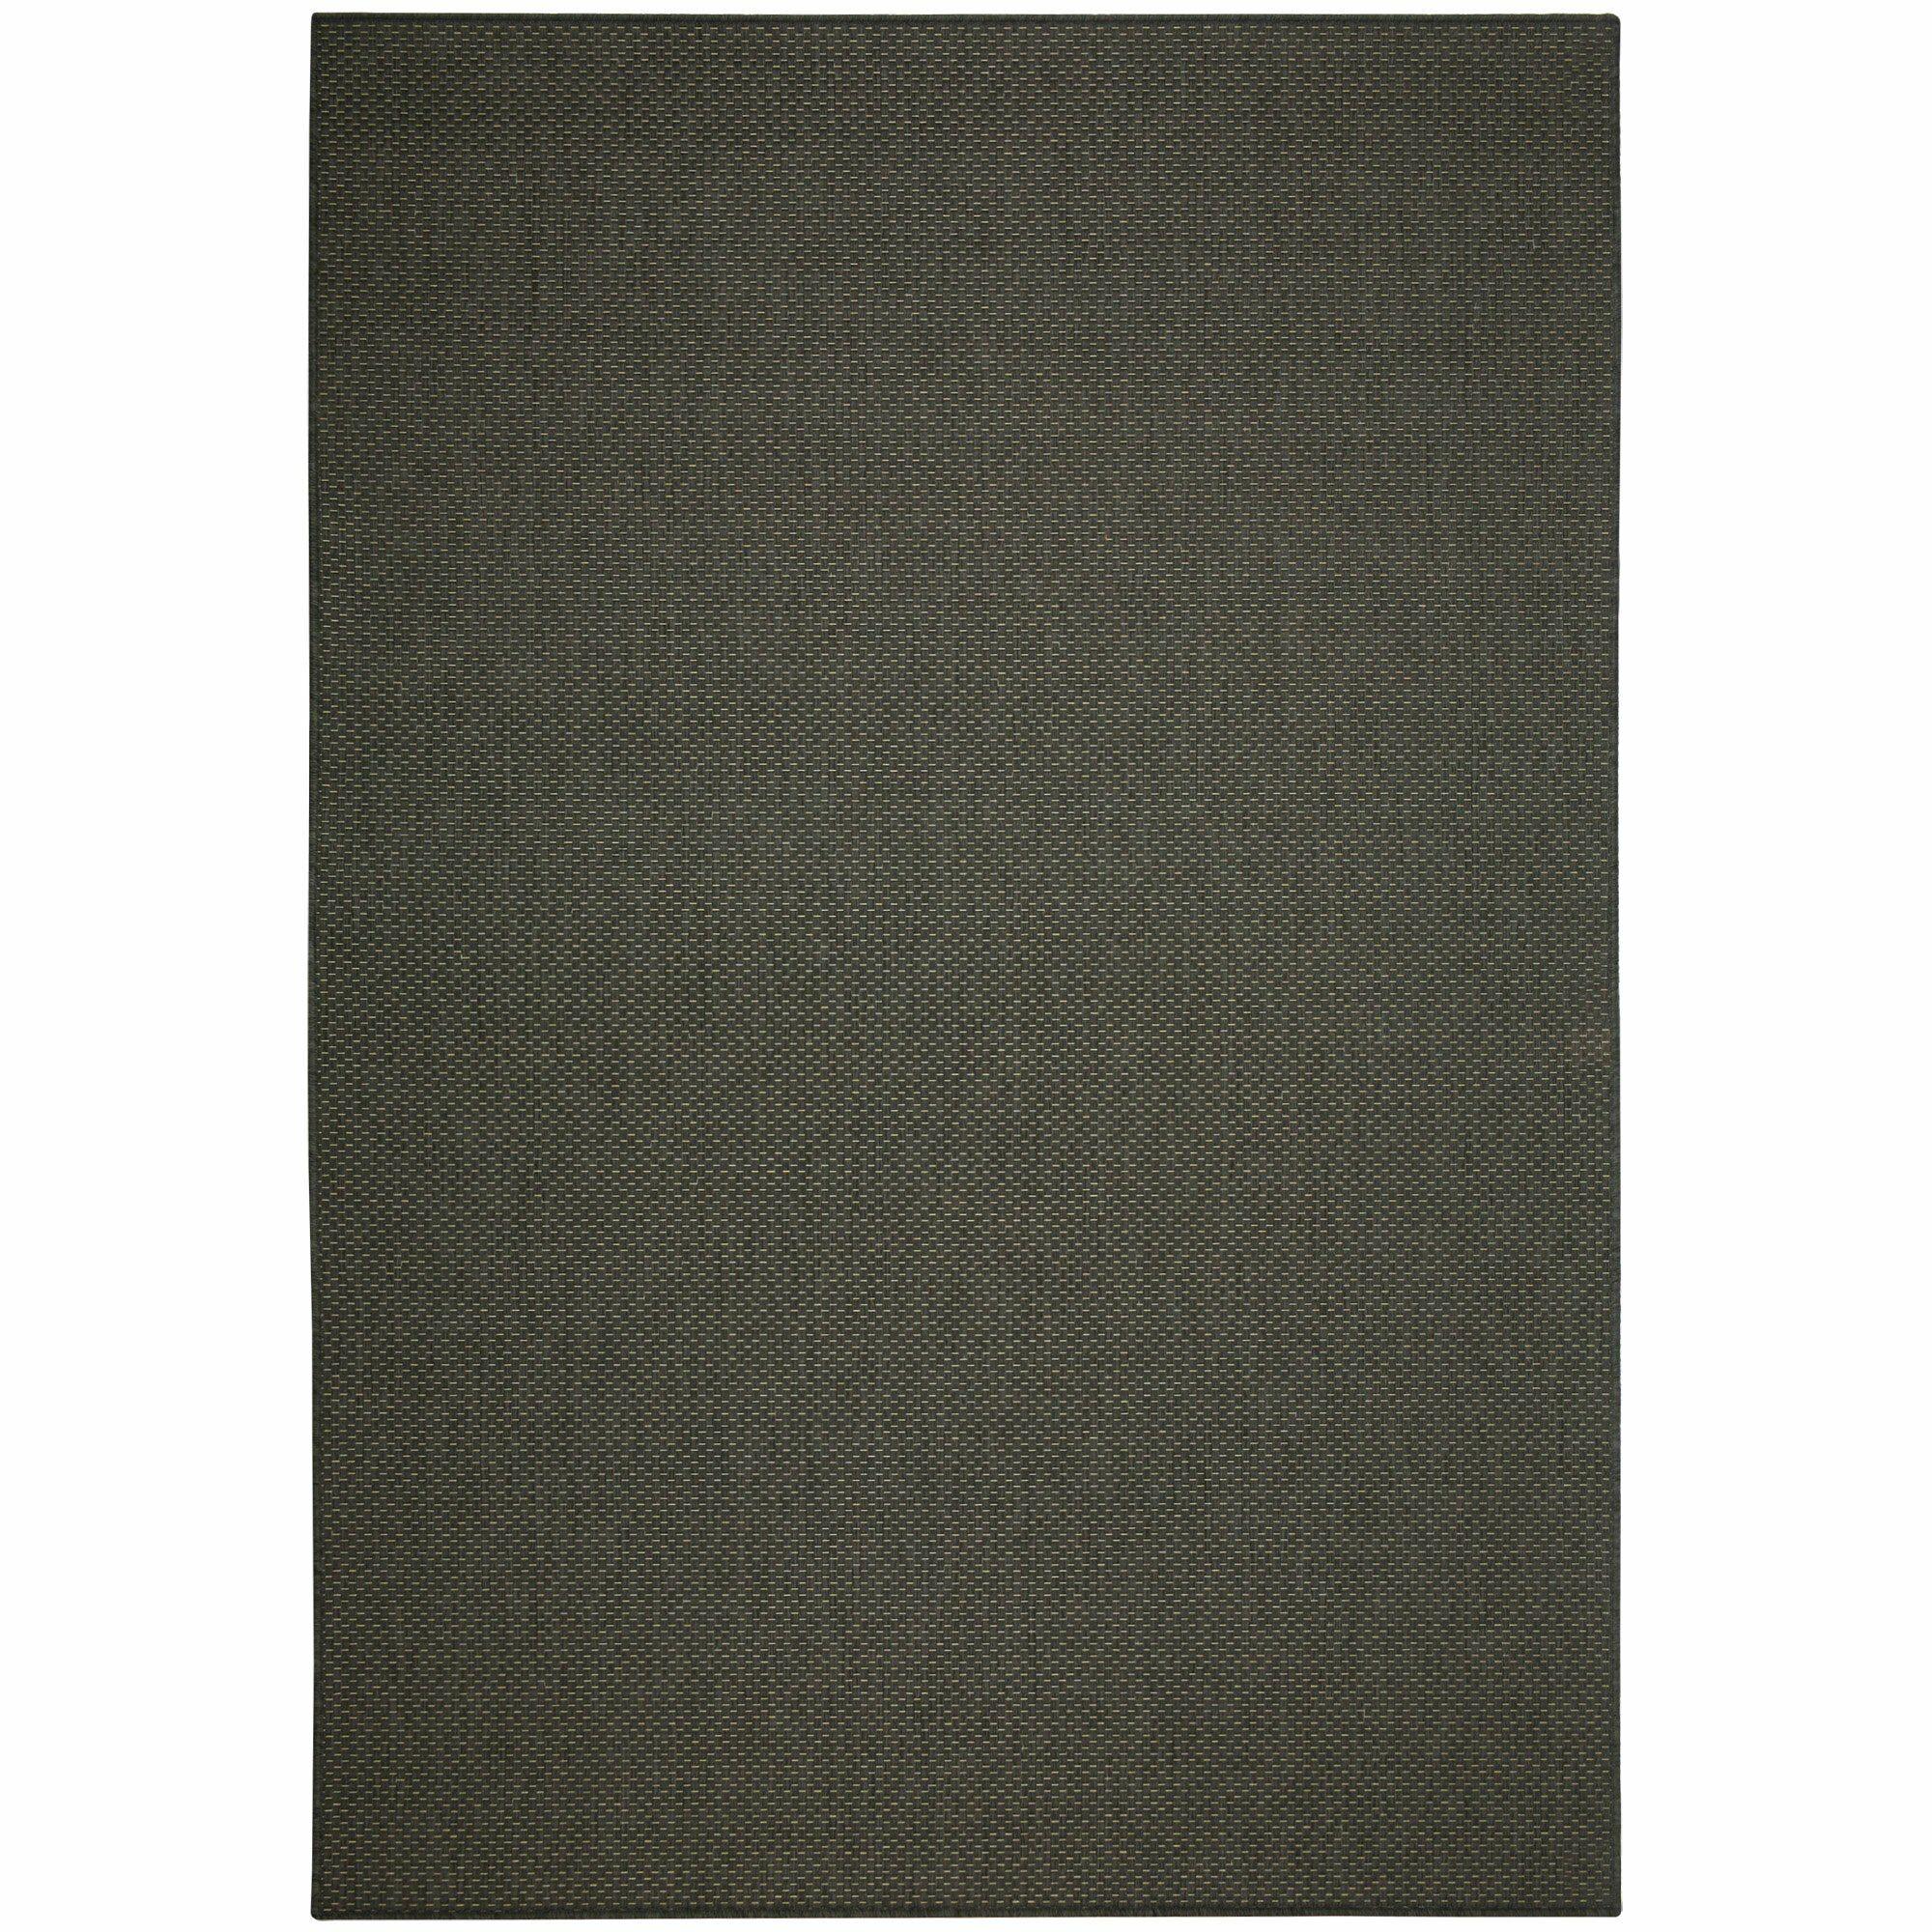 Egan Grey Solid Indoor/Outdoor Area Rug Rug Size: 7'6